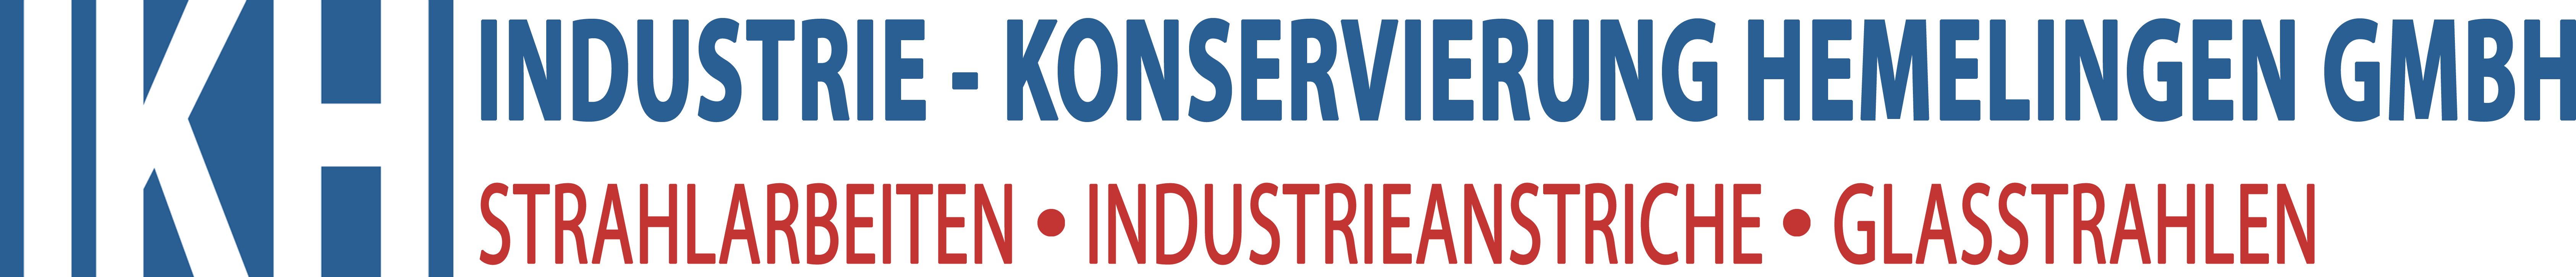 IKH Industrie - Konservierung Hemelingen GmbH